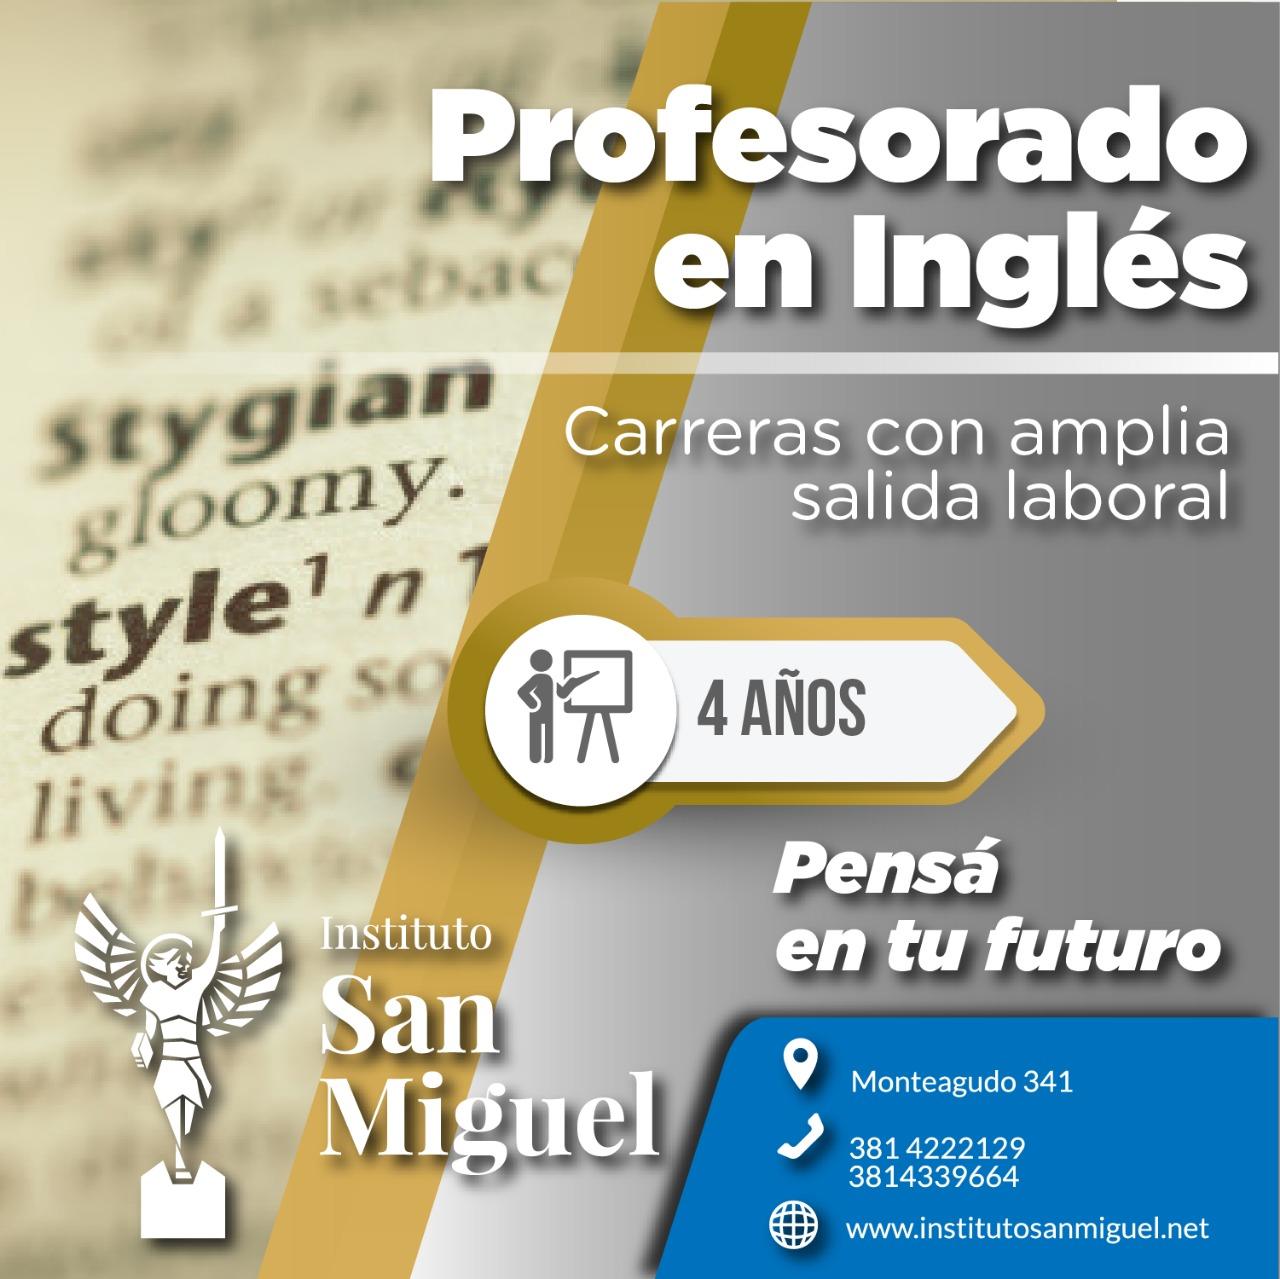 Profesorado en ingles